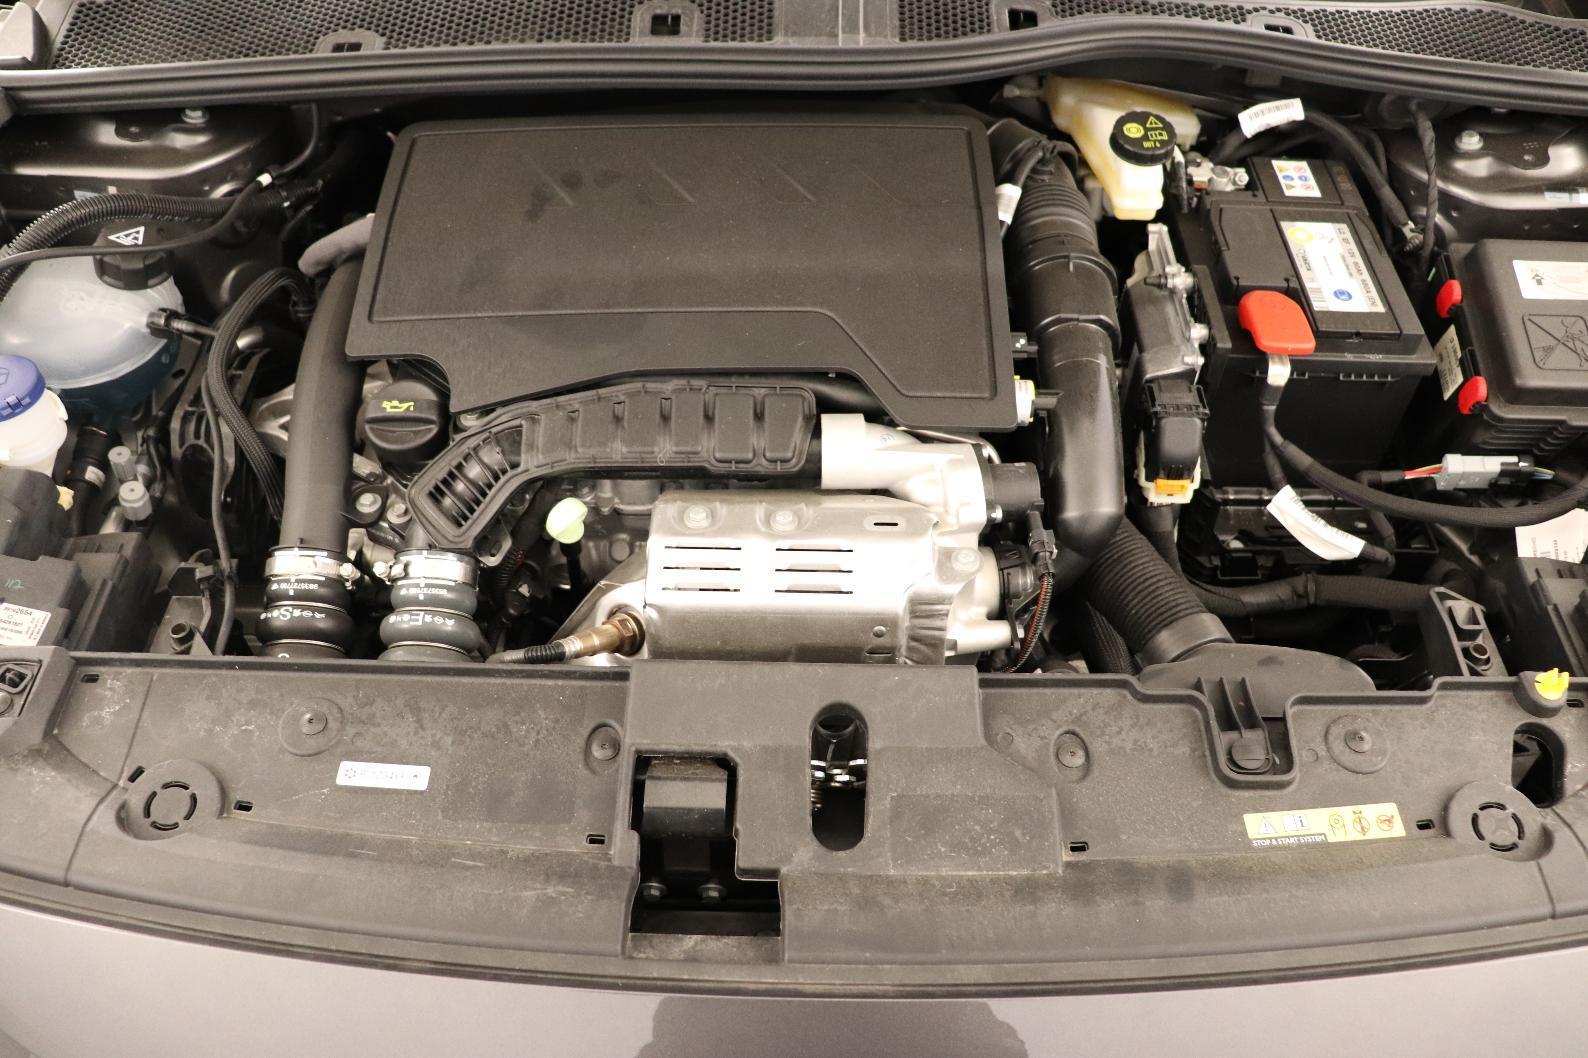 OPEL CORSA 1.2 Turbo 100 ch BVM6 Elegance